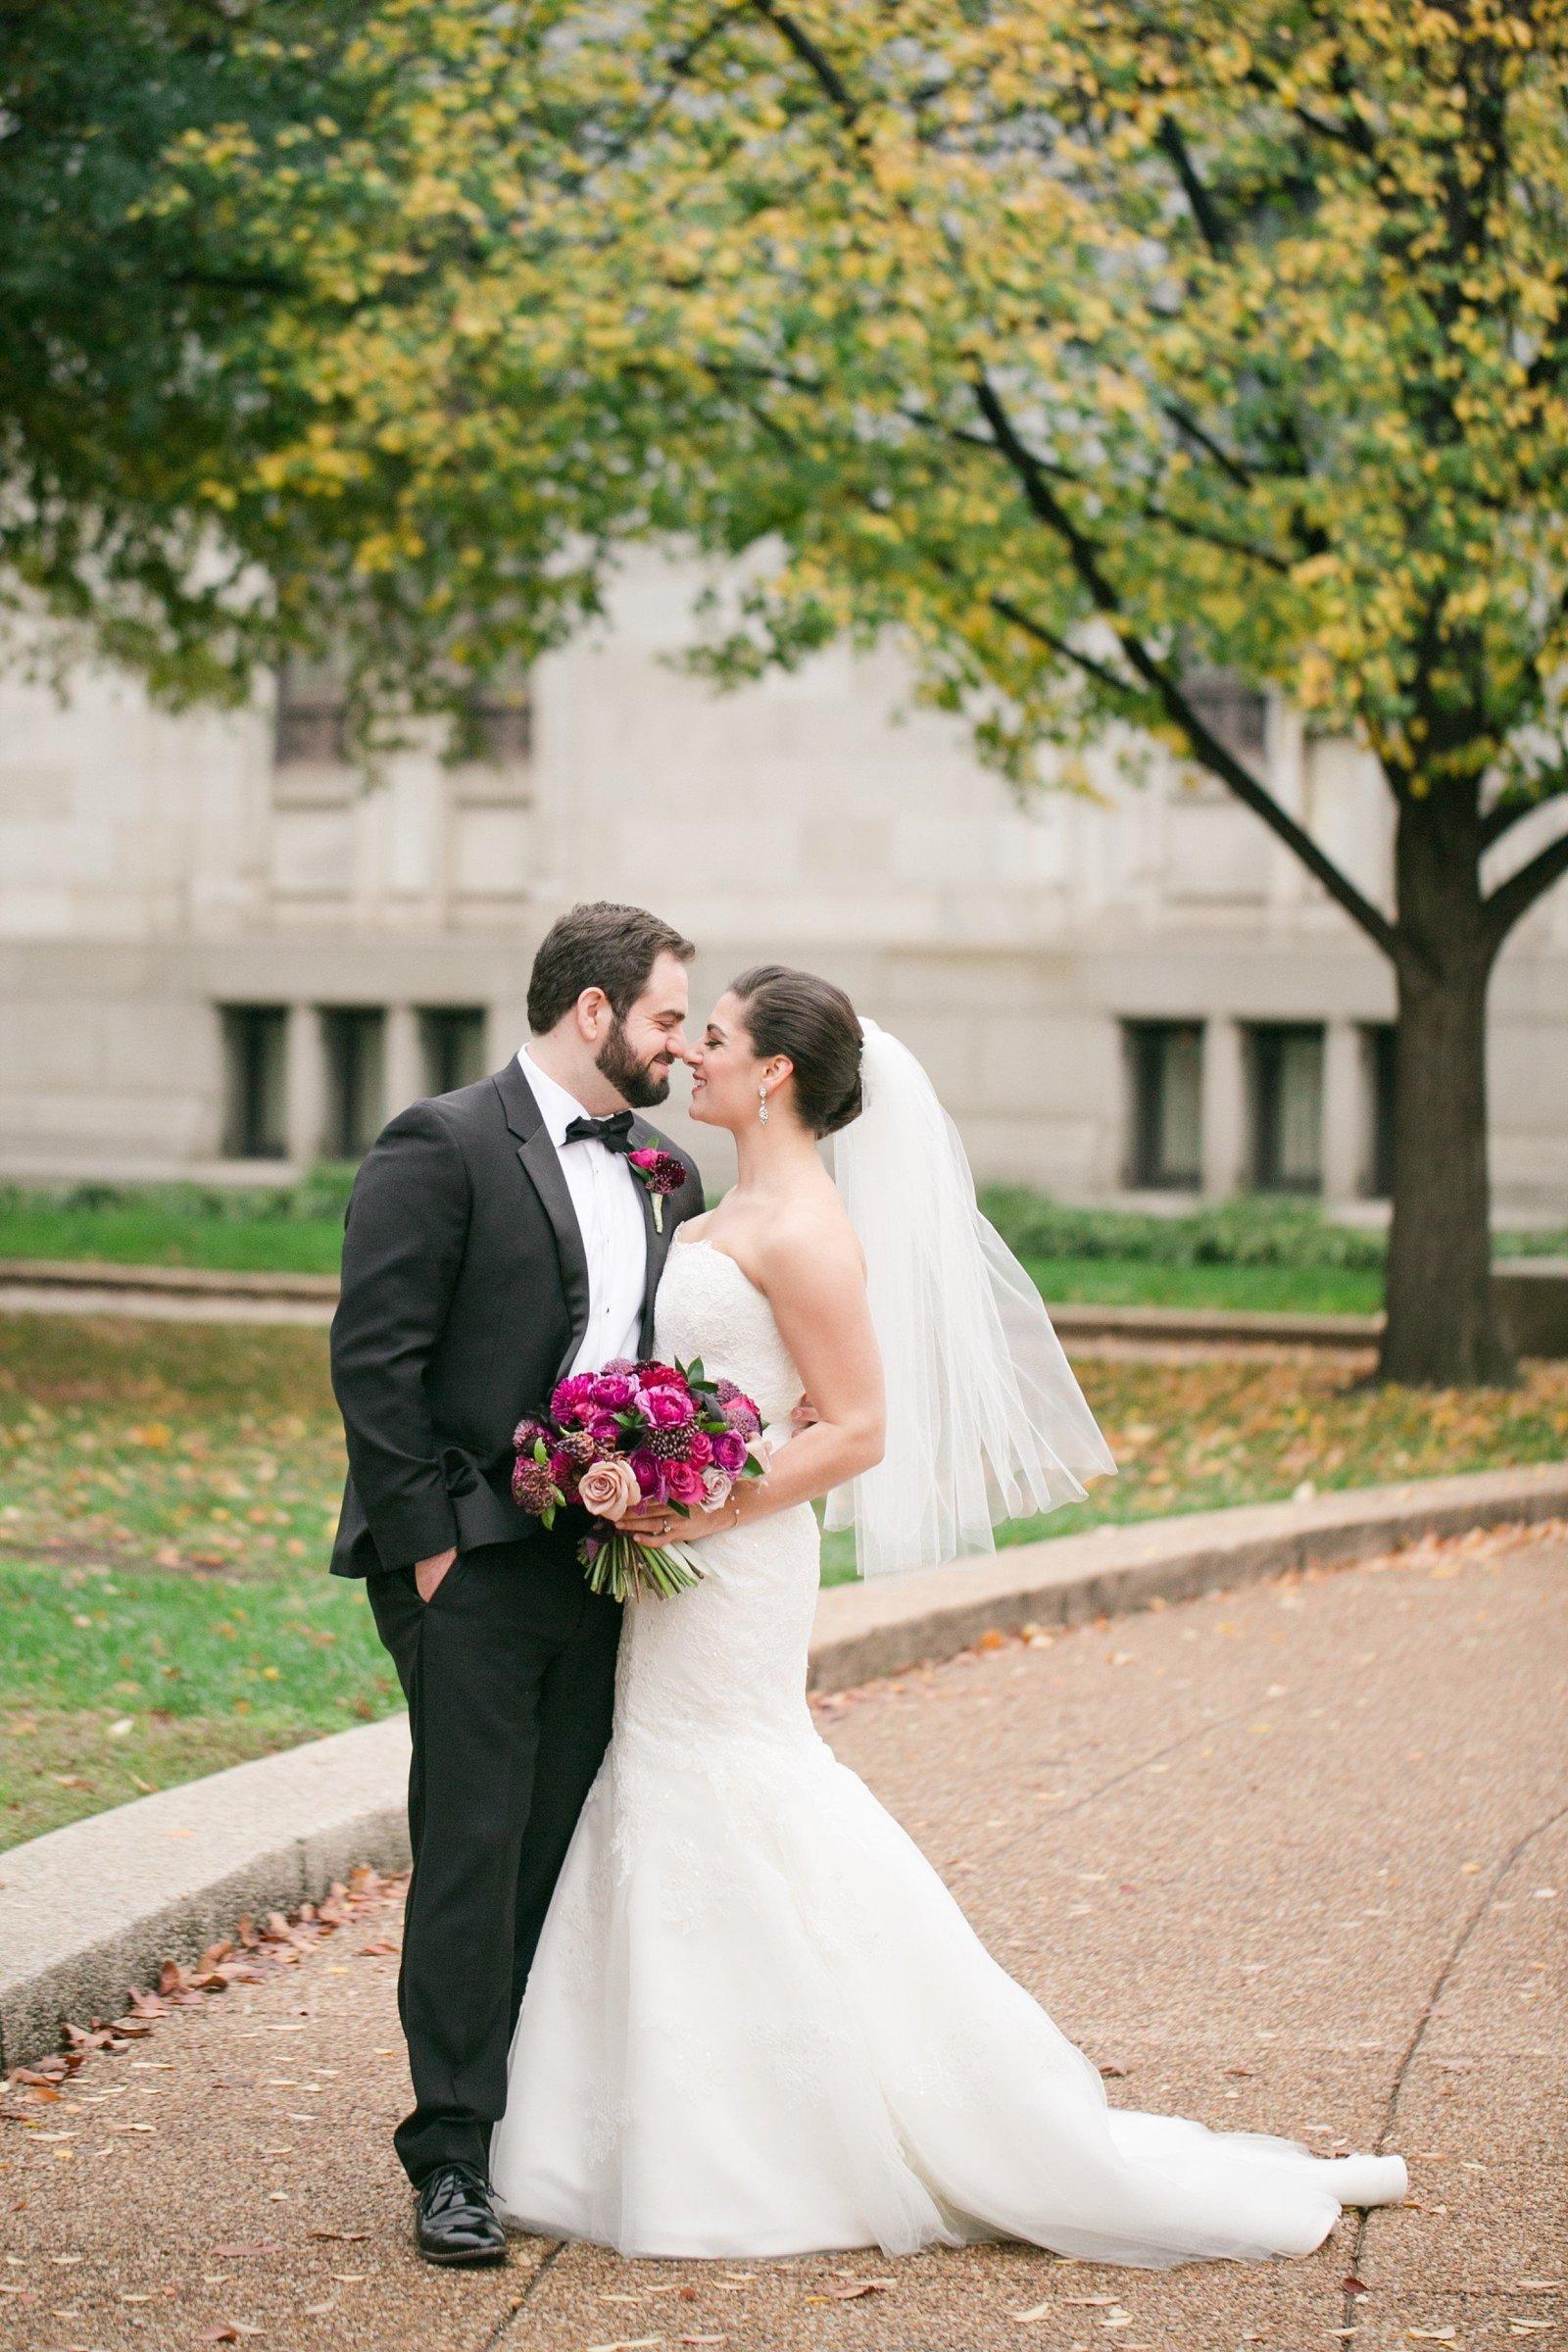 Black-tie-wedding-photos-longview-gallery-dc (150)